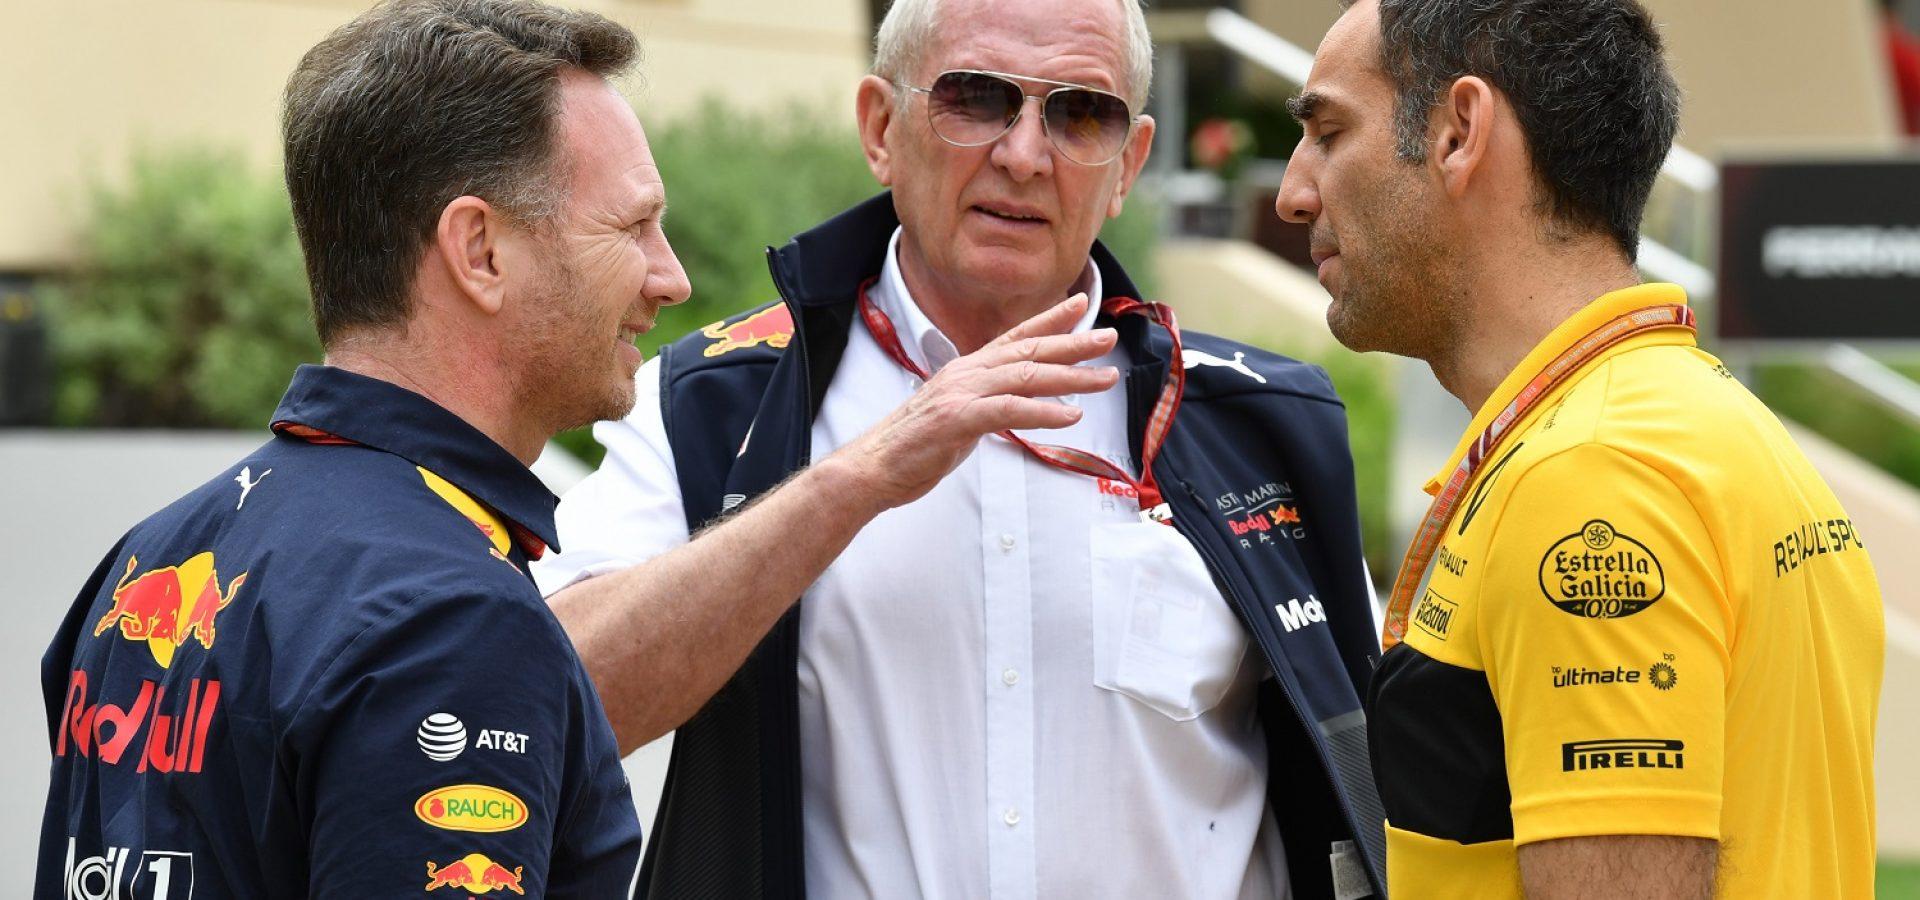 Christian Horner (GBR) Red Bull Racing Team Principal, Dr Helmut Marko (AUT) Red Bull Motorsport Consultant and Cyril Abiteboul (FRA) Renault Sport F1 Managing Director at Formula One World Championship, Rd2, Bahrain Grand Prix, Practice, Bahrain International Circuit, Sakhir, Bahrain, Friday 6 April 2018.